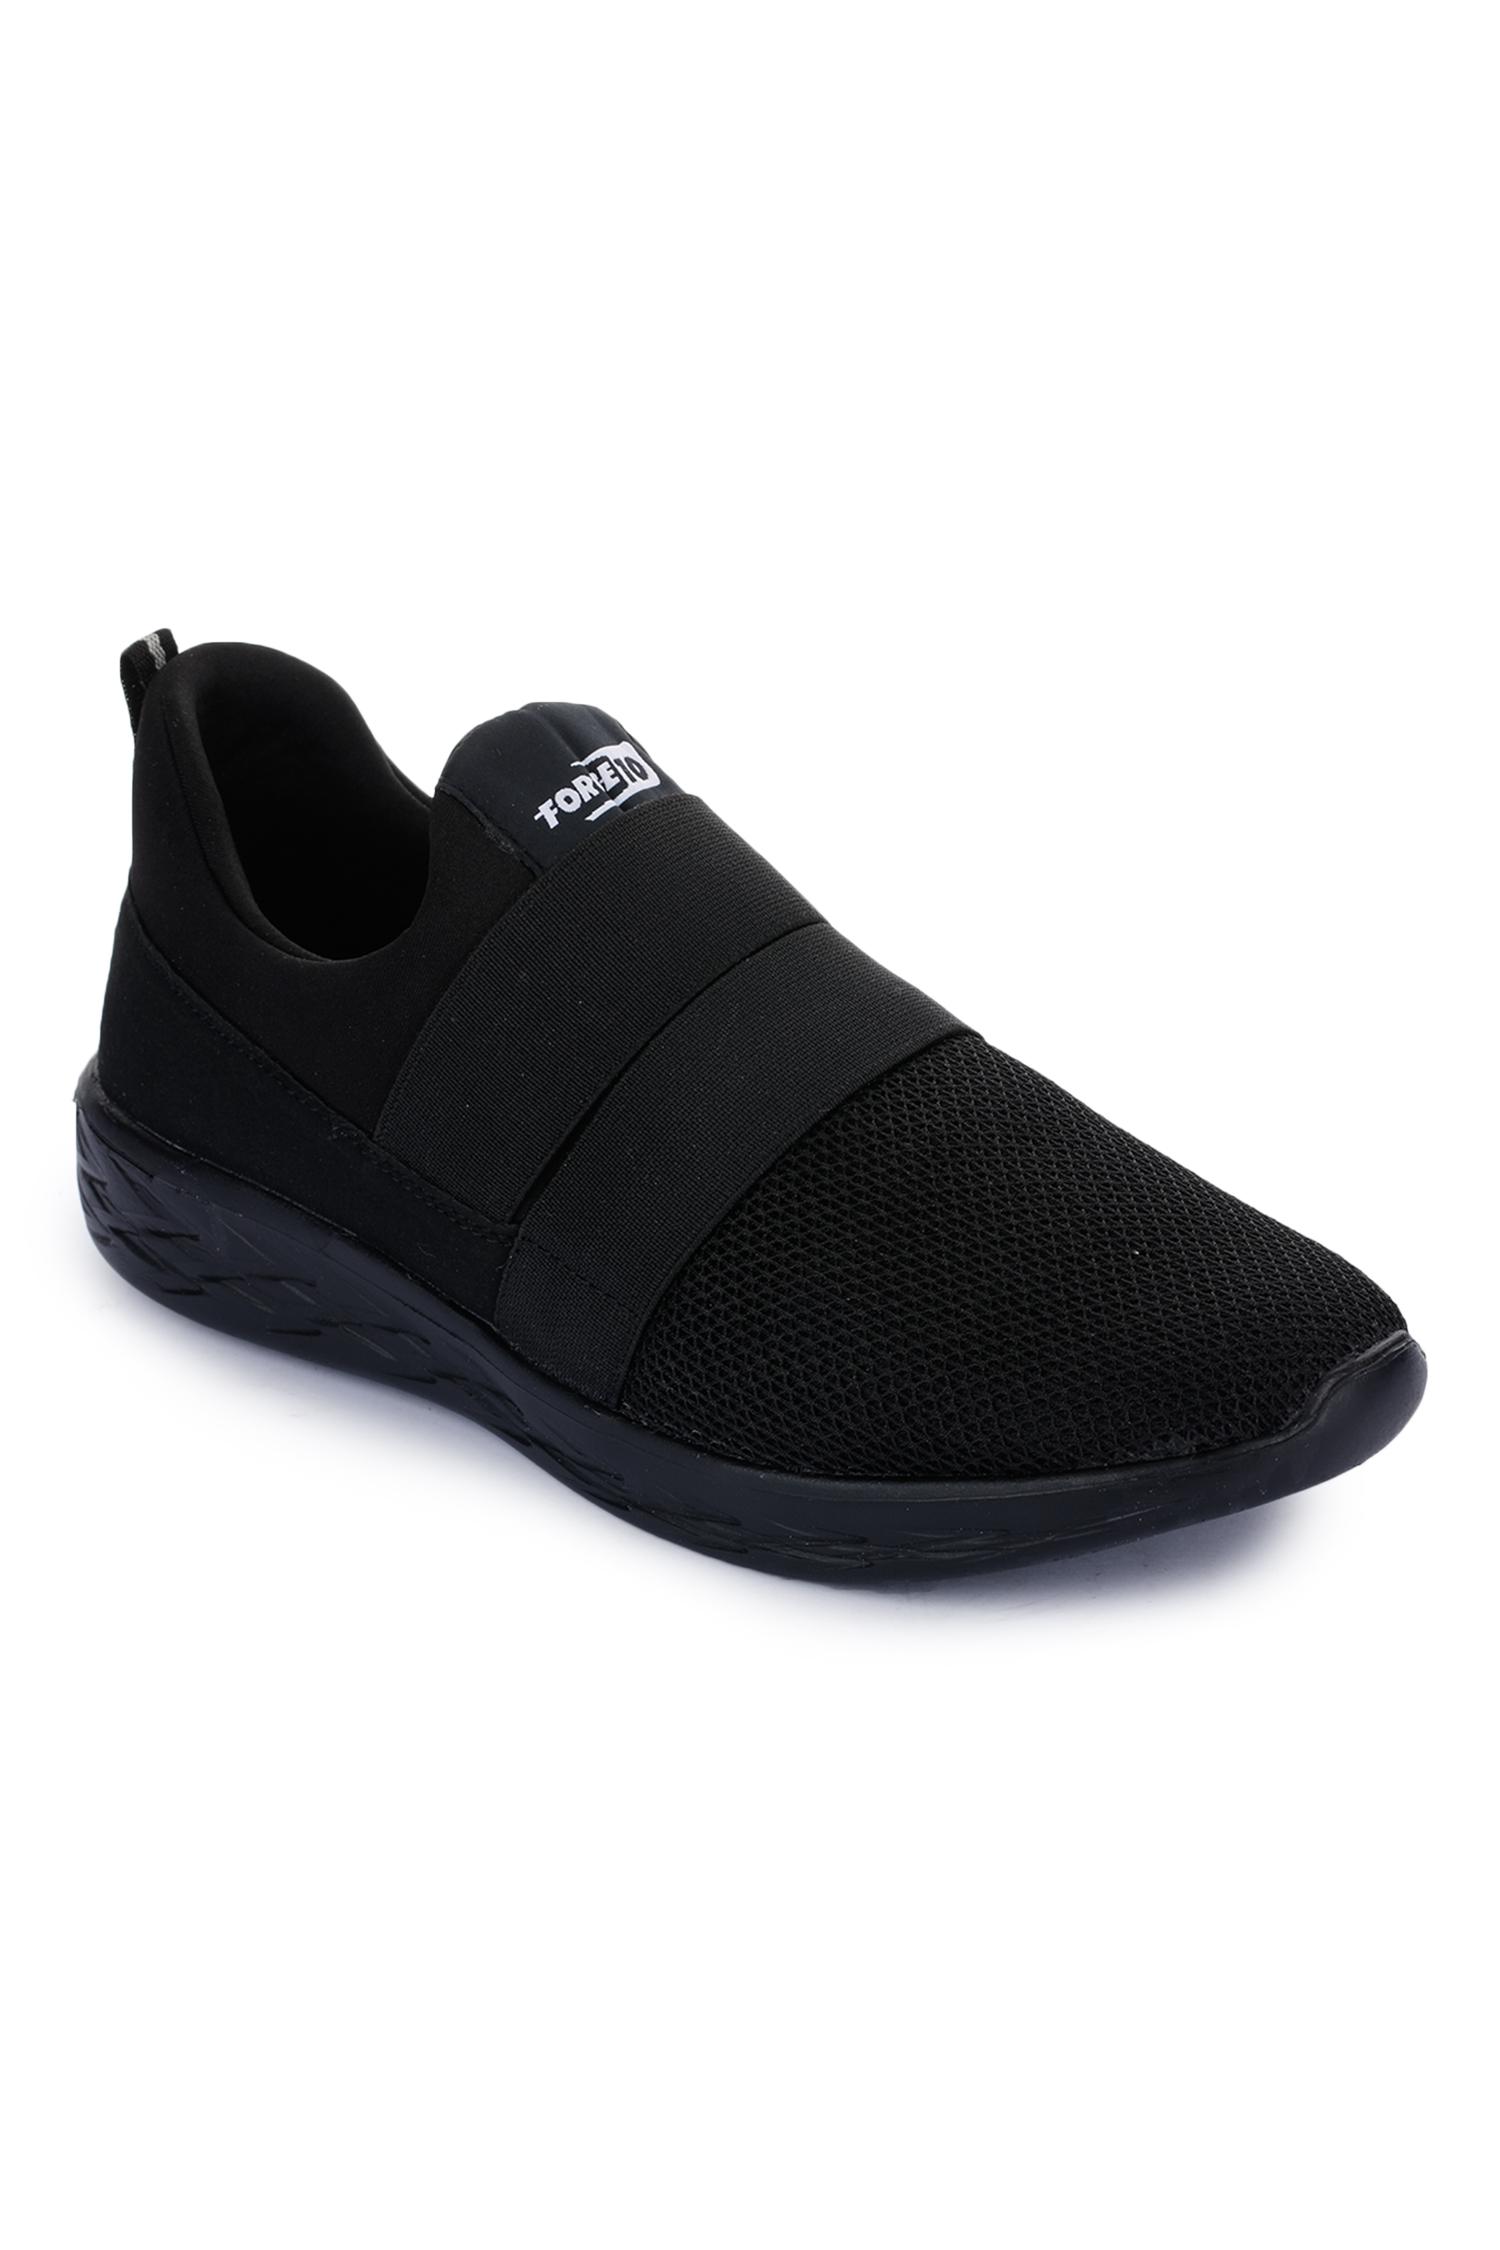 Liberty | Liberty Force 10 Black Sports Wailking Shoes TIGOZ_Black For - Men